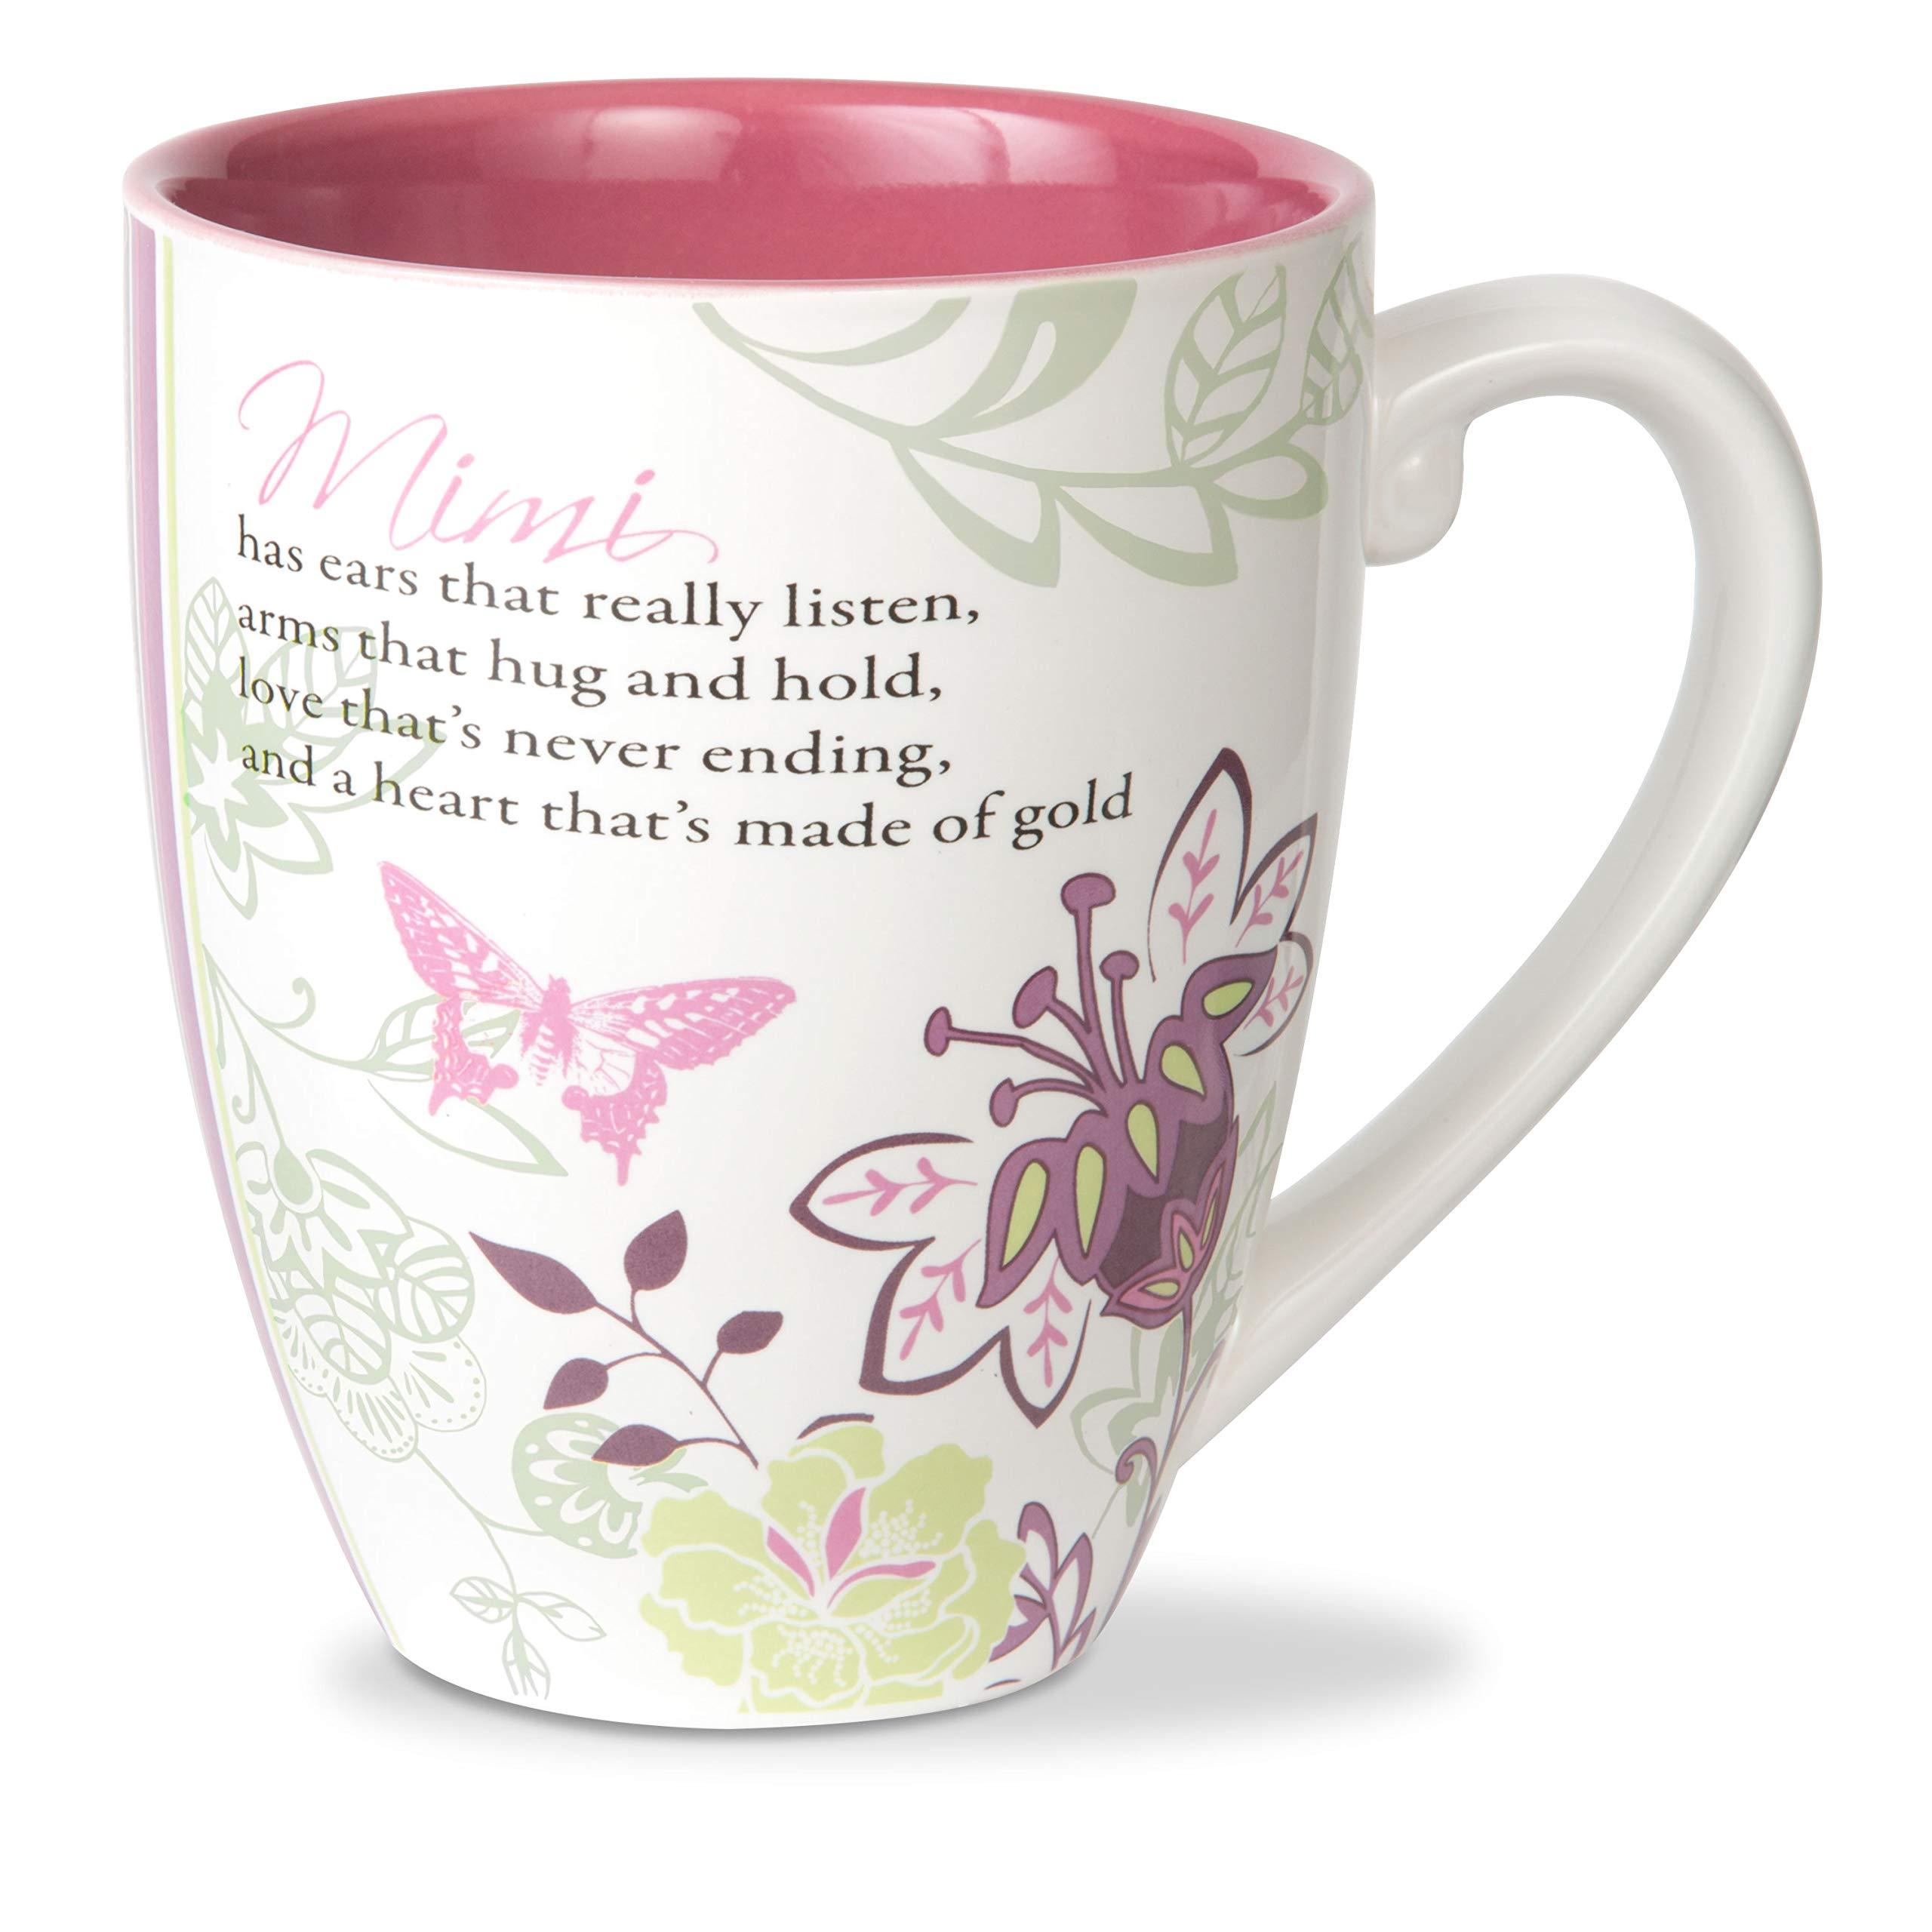 Pavilion Gift Company Mark My Words Mimi Floral Butterfly Grandma Coffee Tea Mug Large Pink Buy Online In Solomon Islands At Solomon Desertcart Com Productid 33627290